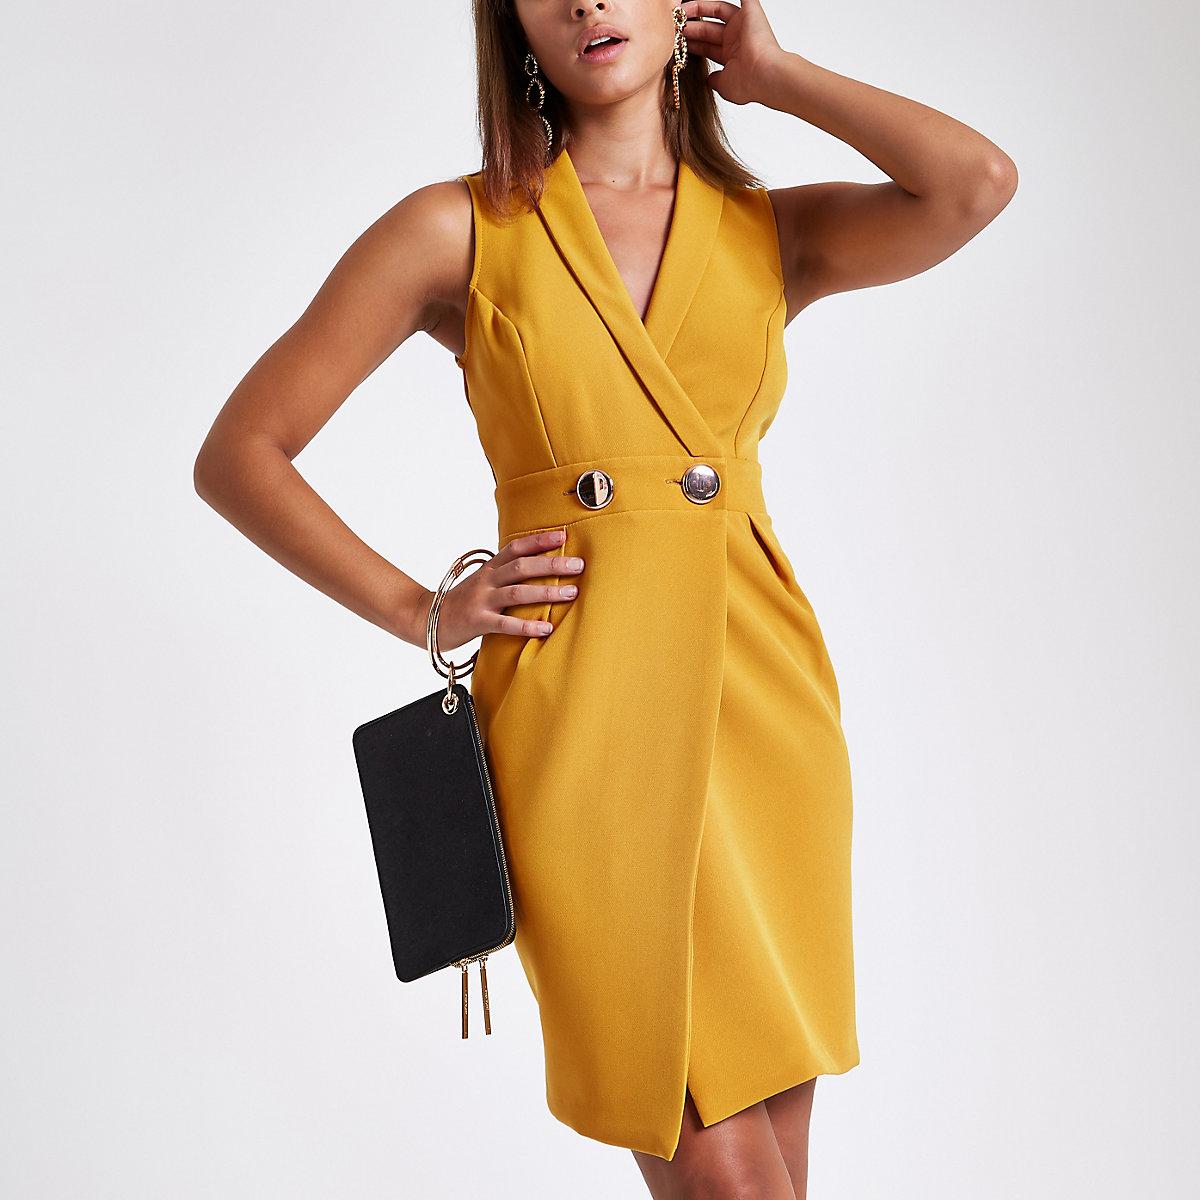 Robe courte portefeuille ajustée jaune foncé style smoking